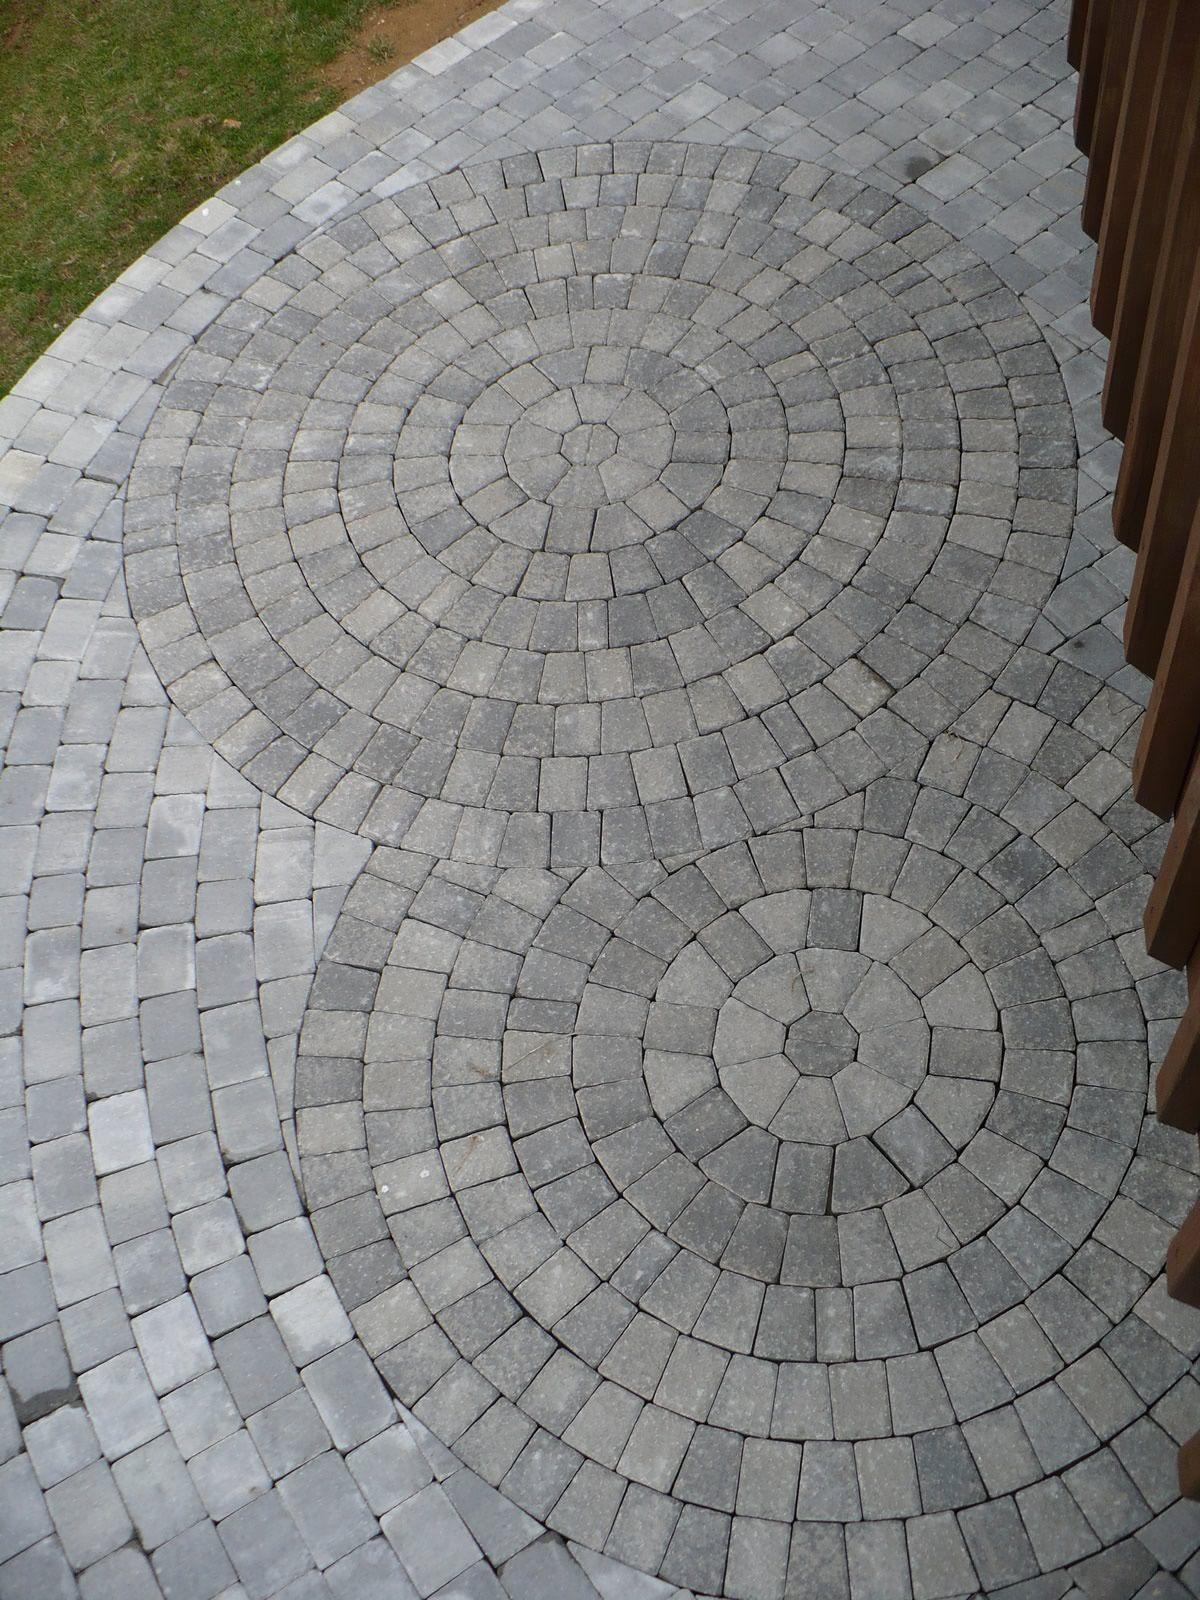 Planning A Successful Hardscape Installation Hardscape Outdoor Paving Pavement Design